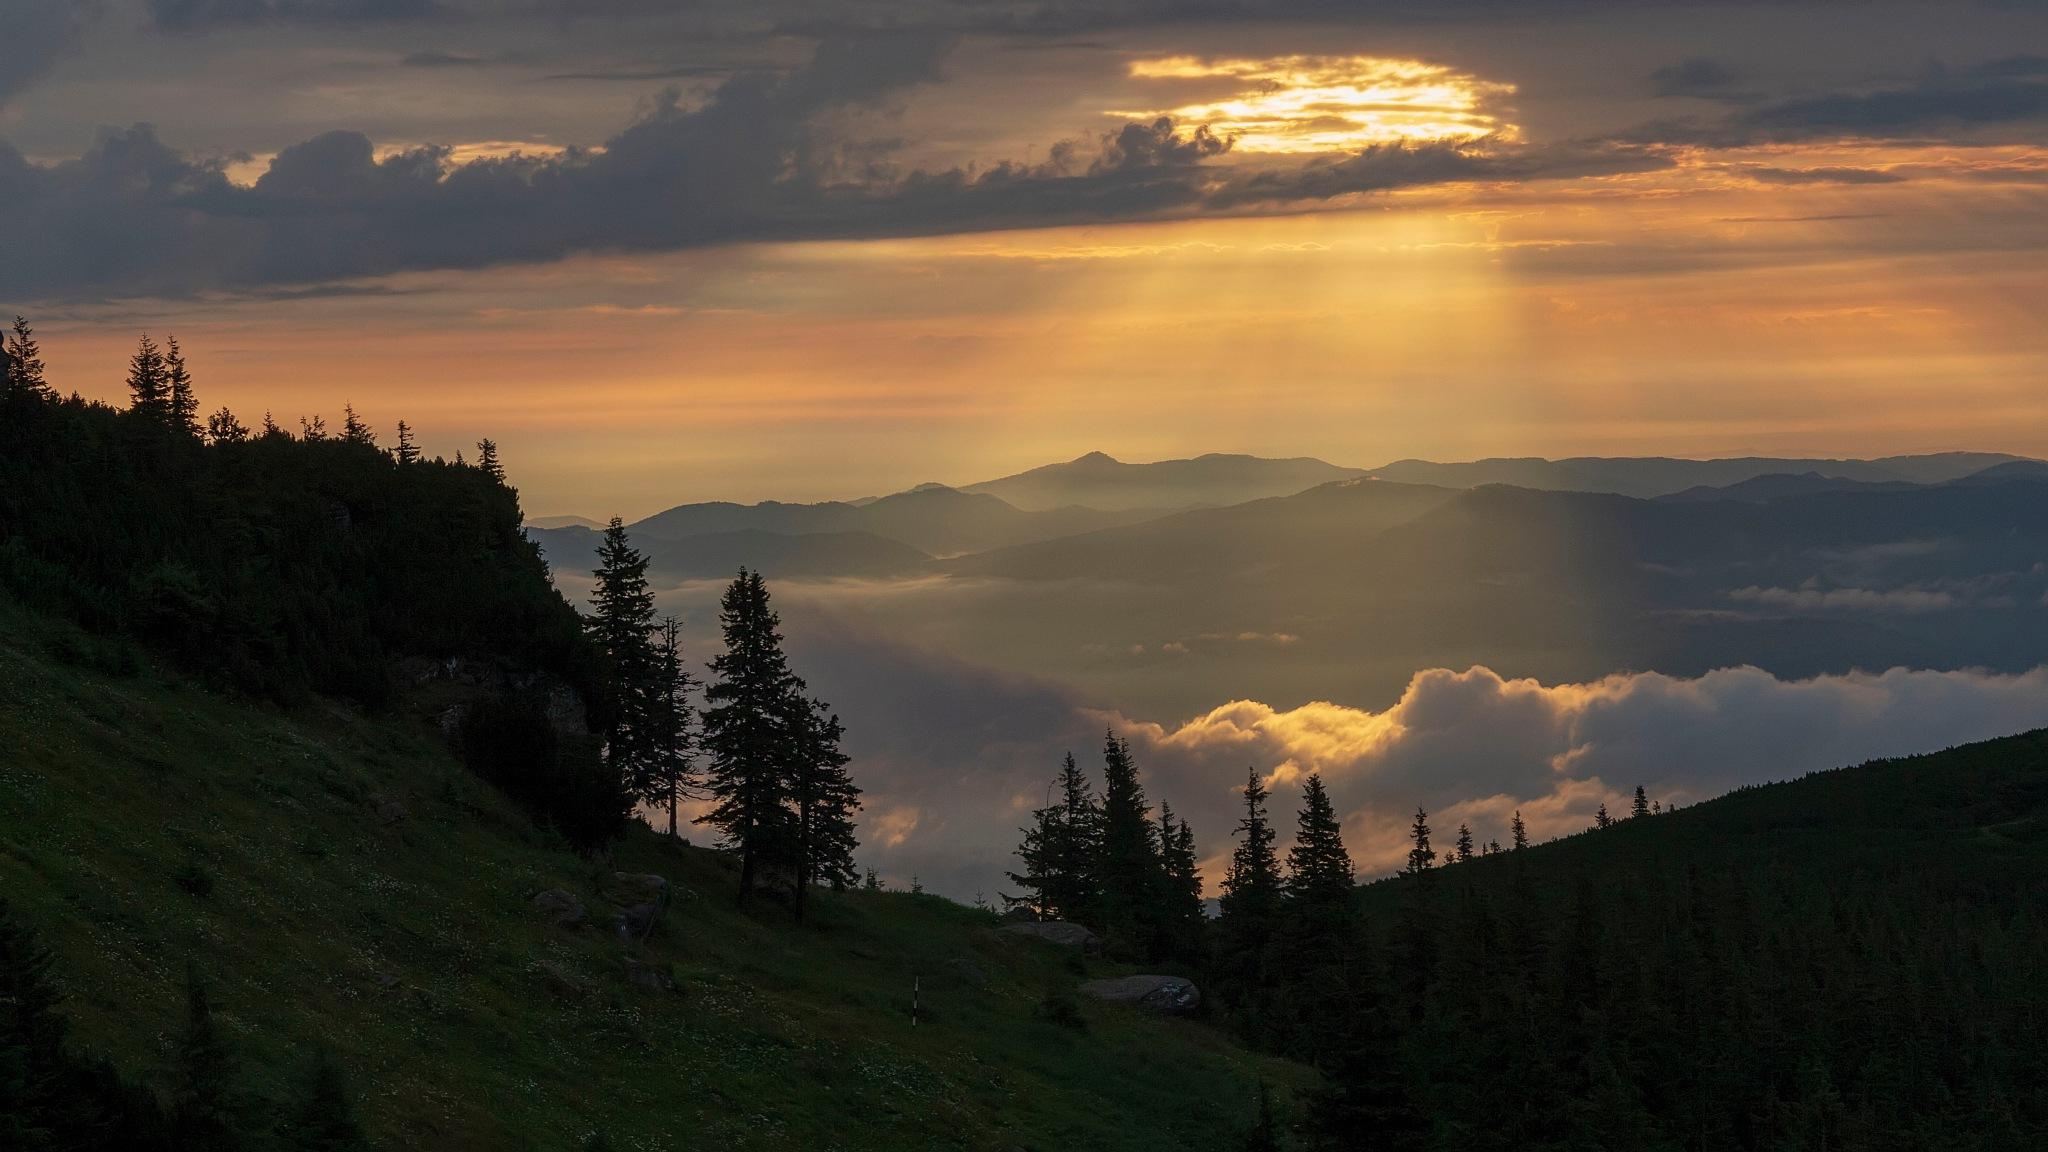 Morning light by cristian.negrus